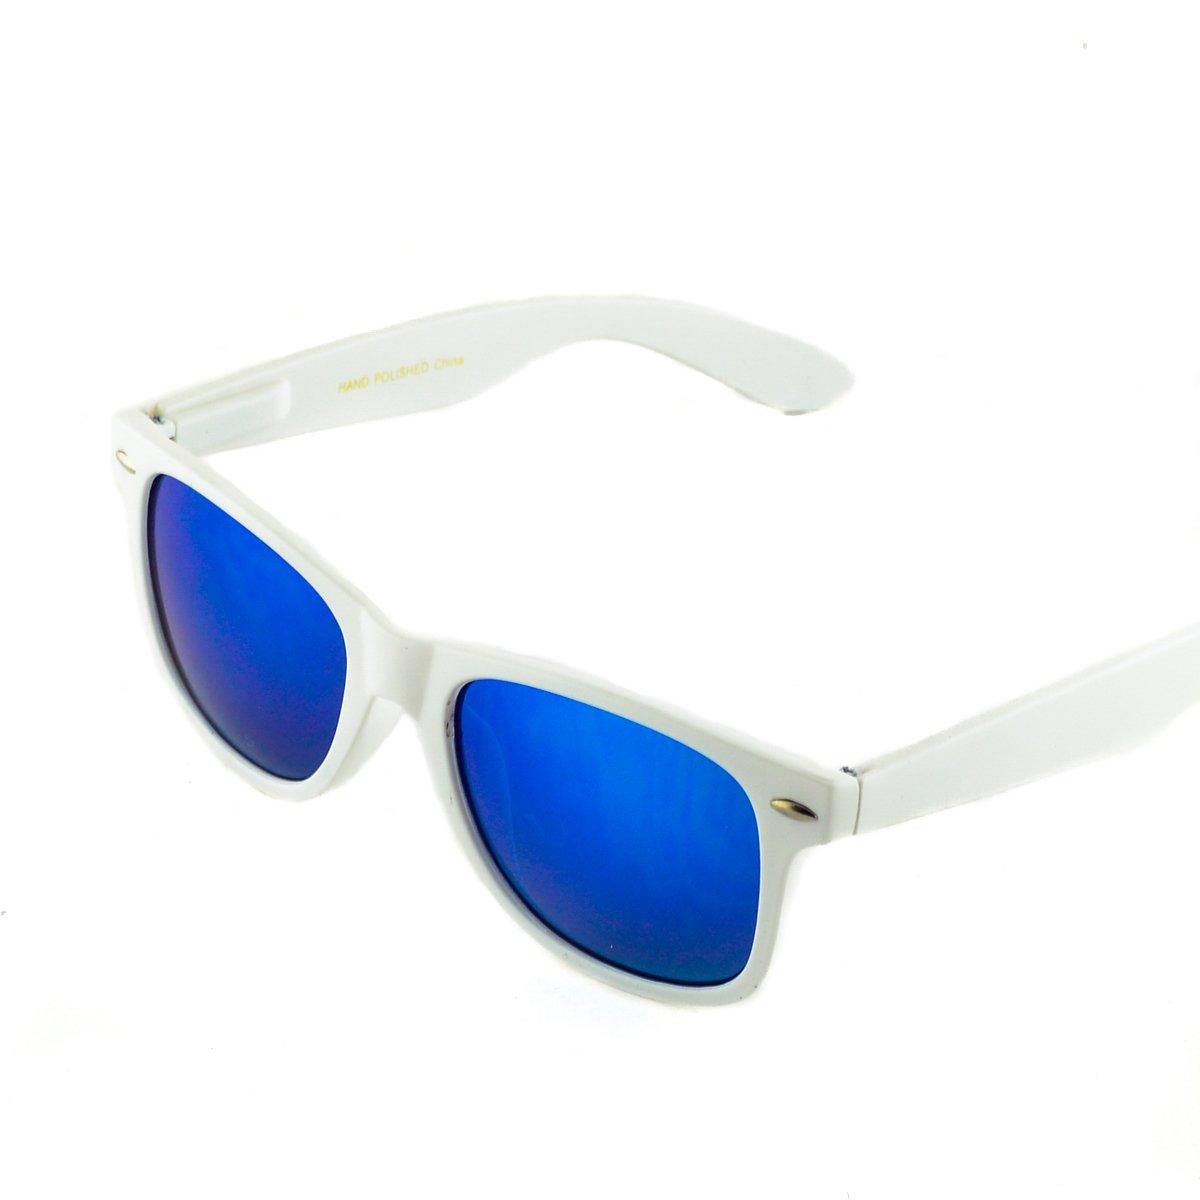 MJ Eyewear Vintage Wayfarer Style Sunglasses MJ-W-W/BLU